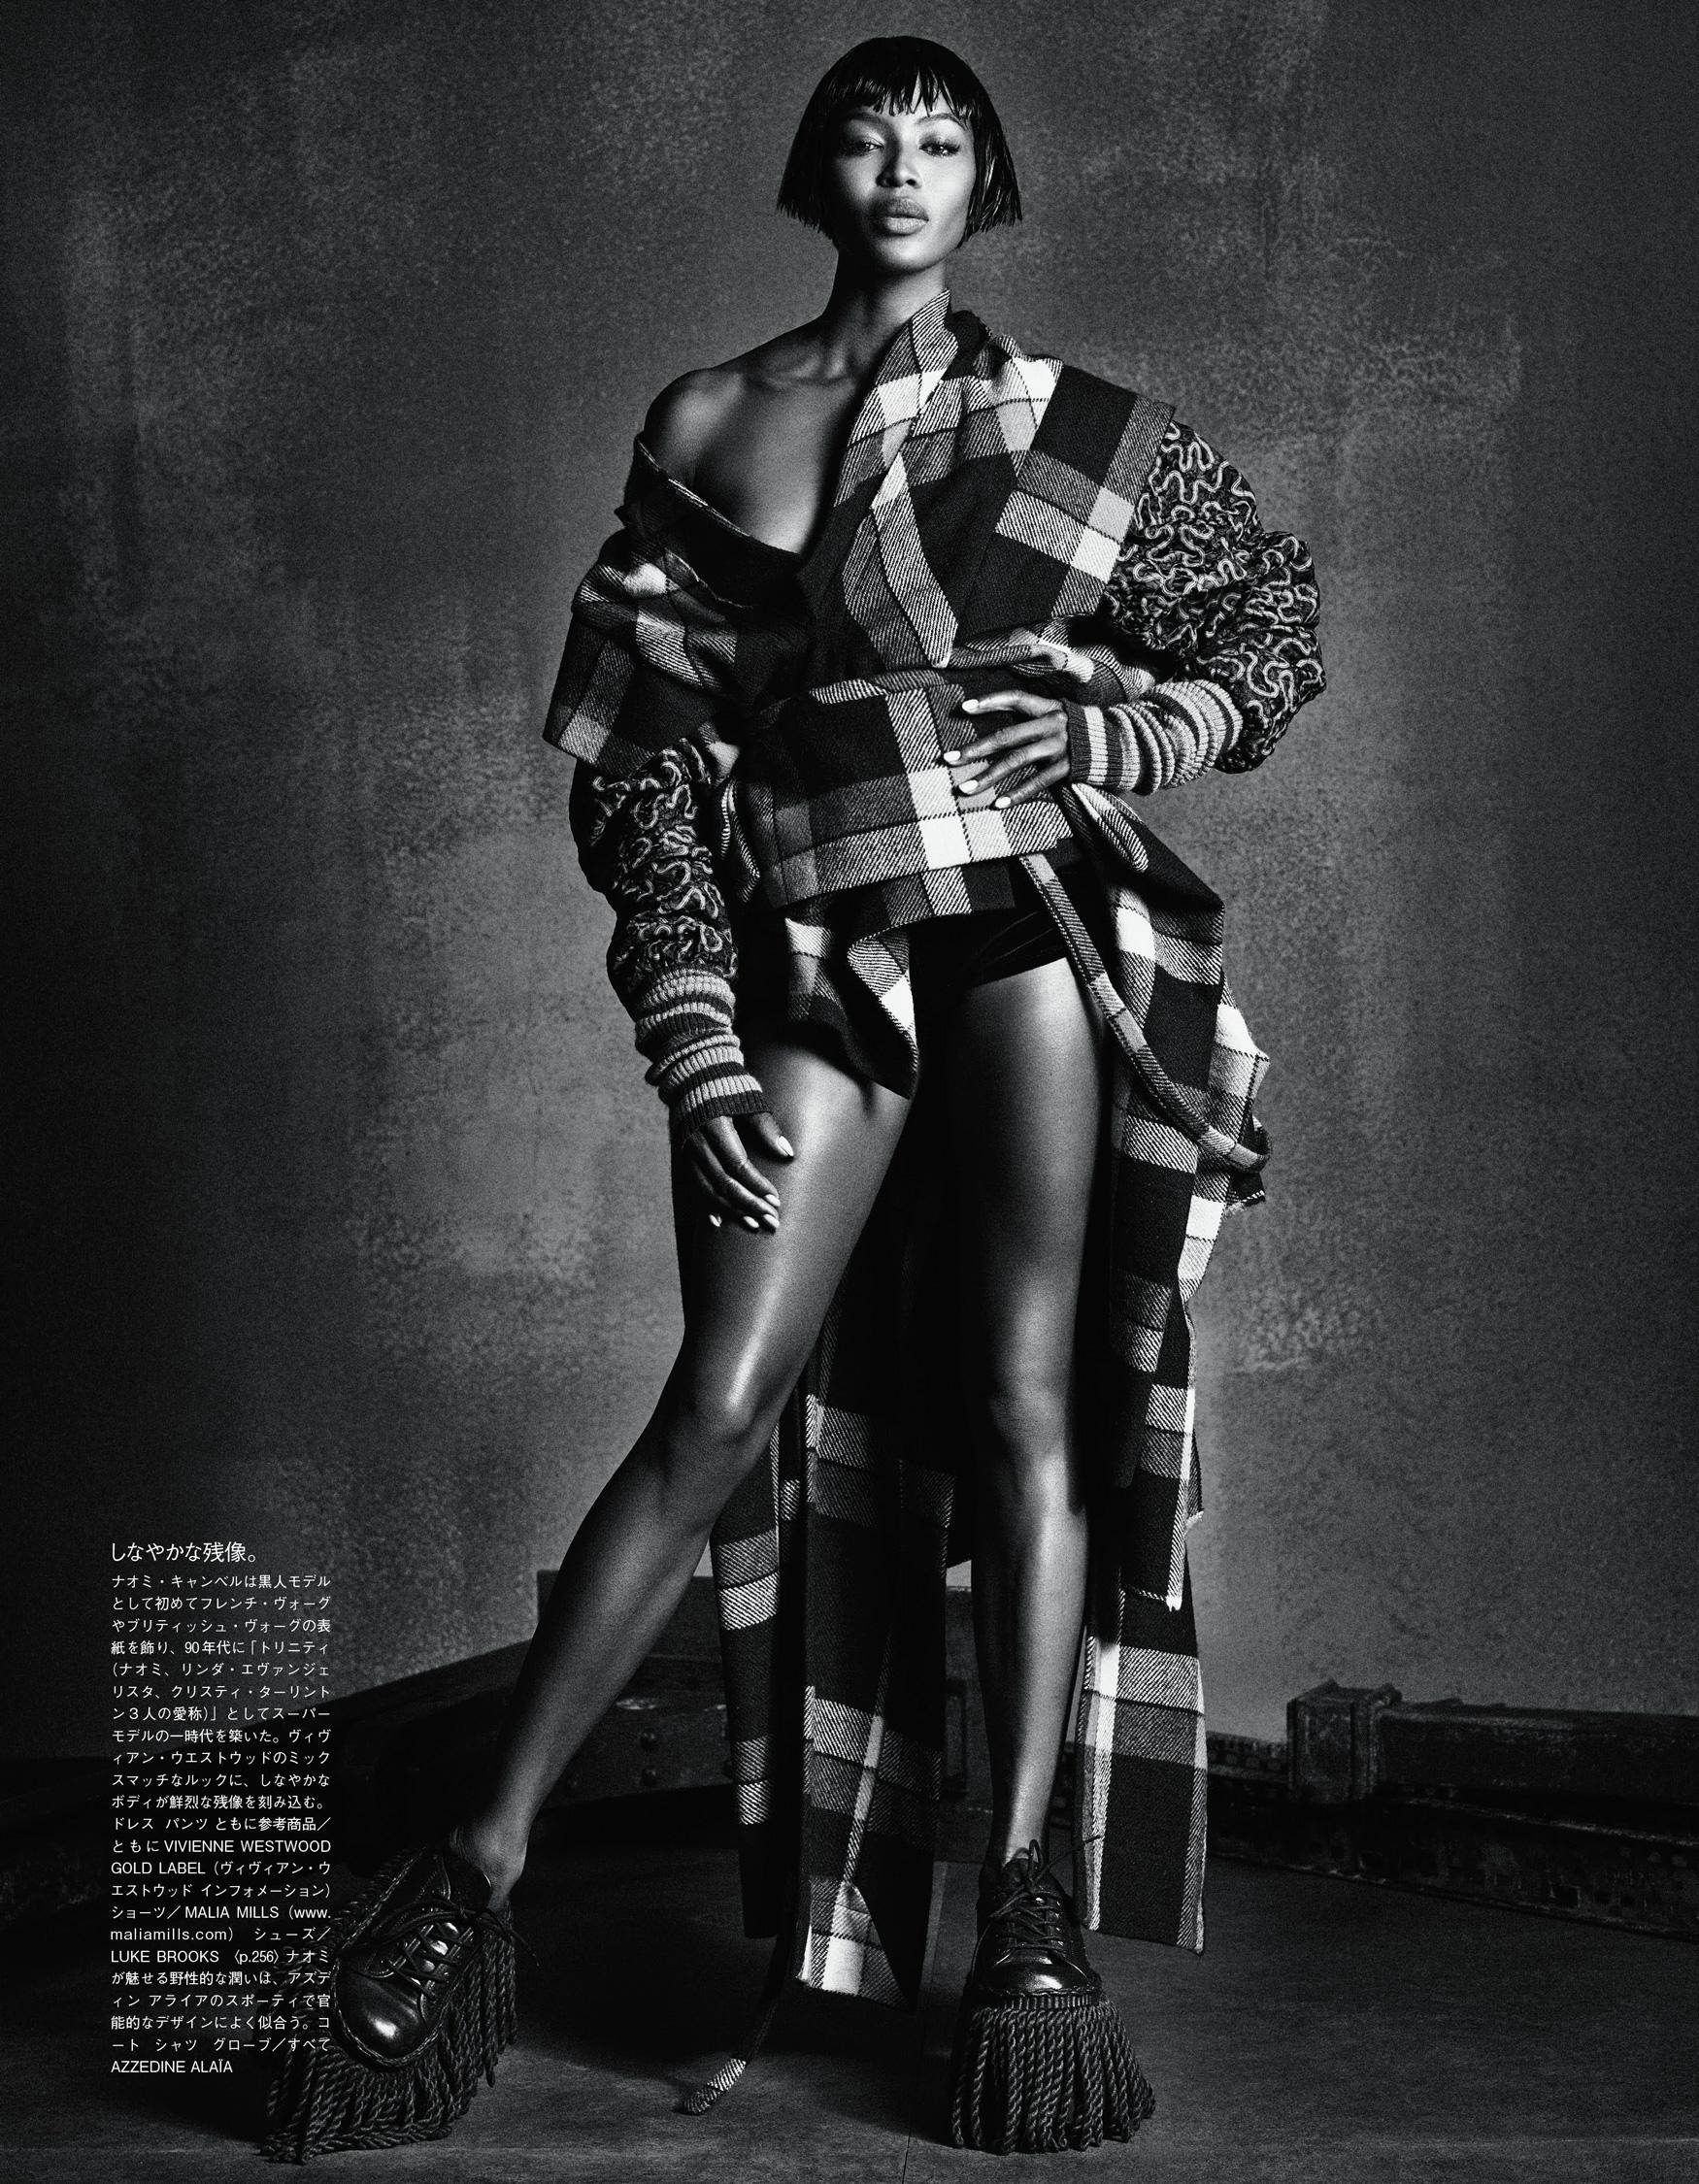 Giovanna-Battaglia-The-Icons-Of-Perfections-Vogue-Japan-15th-Anniversary-Issue-Luigi-Iango-V181_257_200-11.jpg